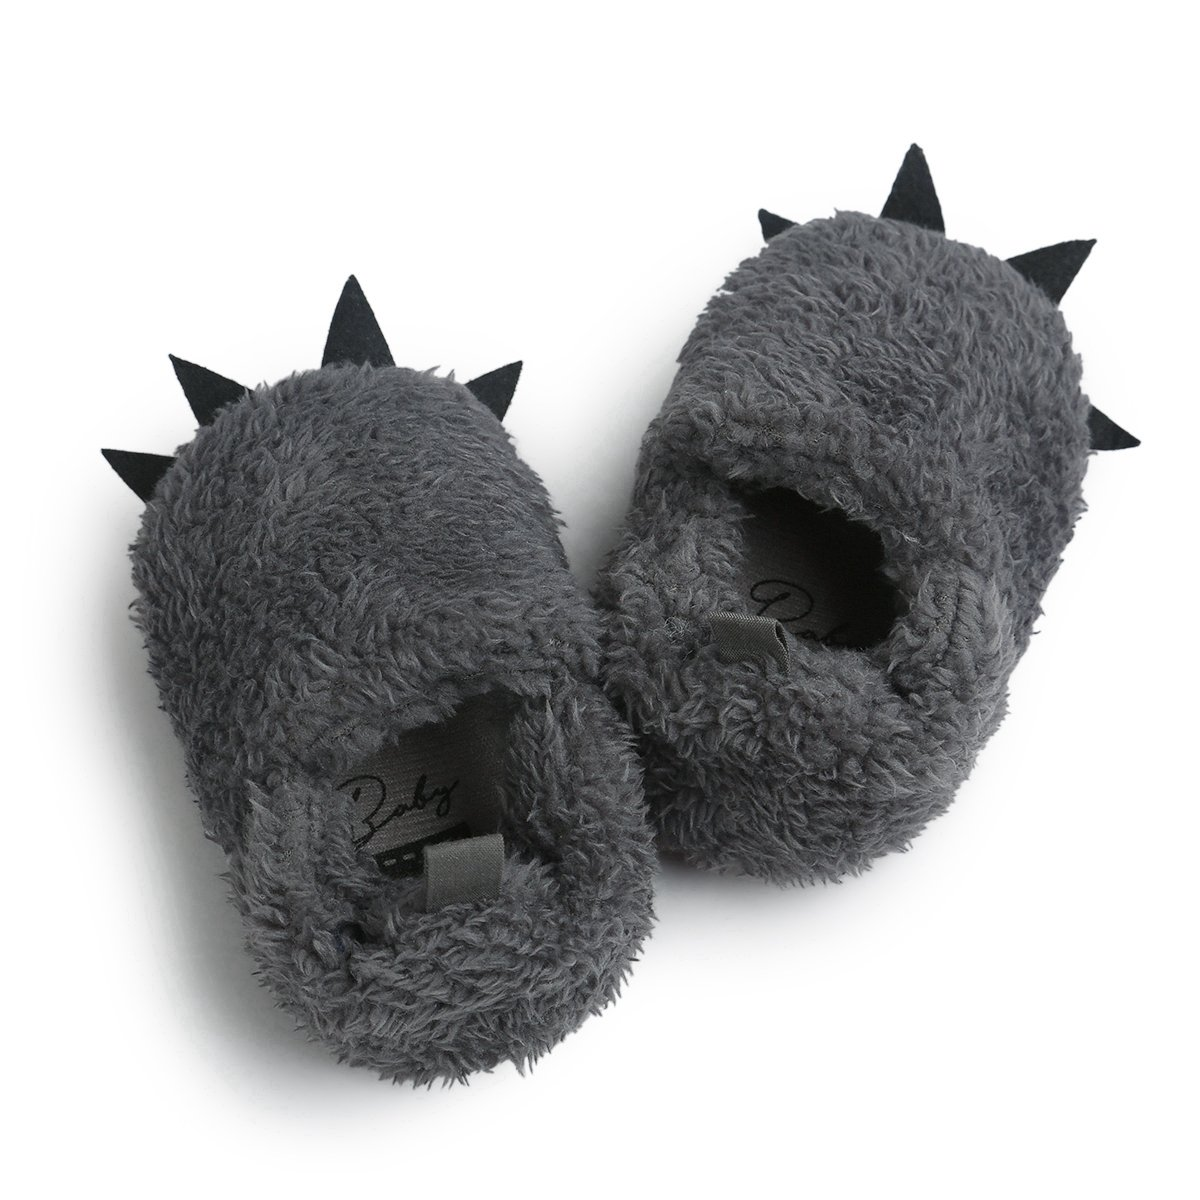 Vanbuy Baby Boys Girls Shoes Bear Paw Animal Slippers Boots Newborn Infant Crib Shoes